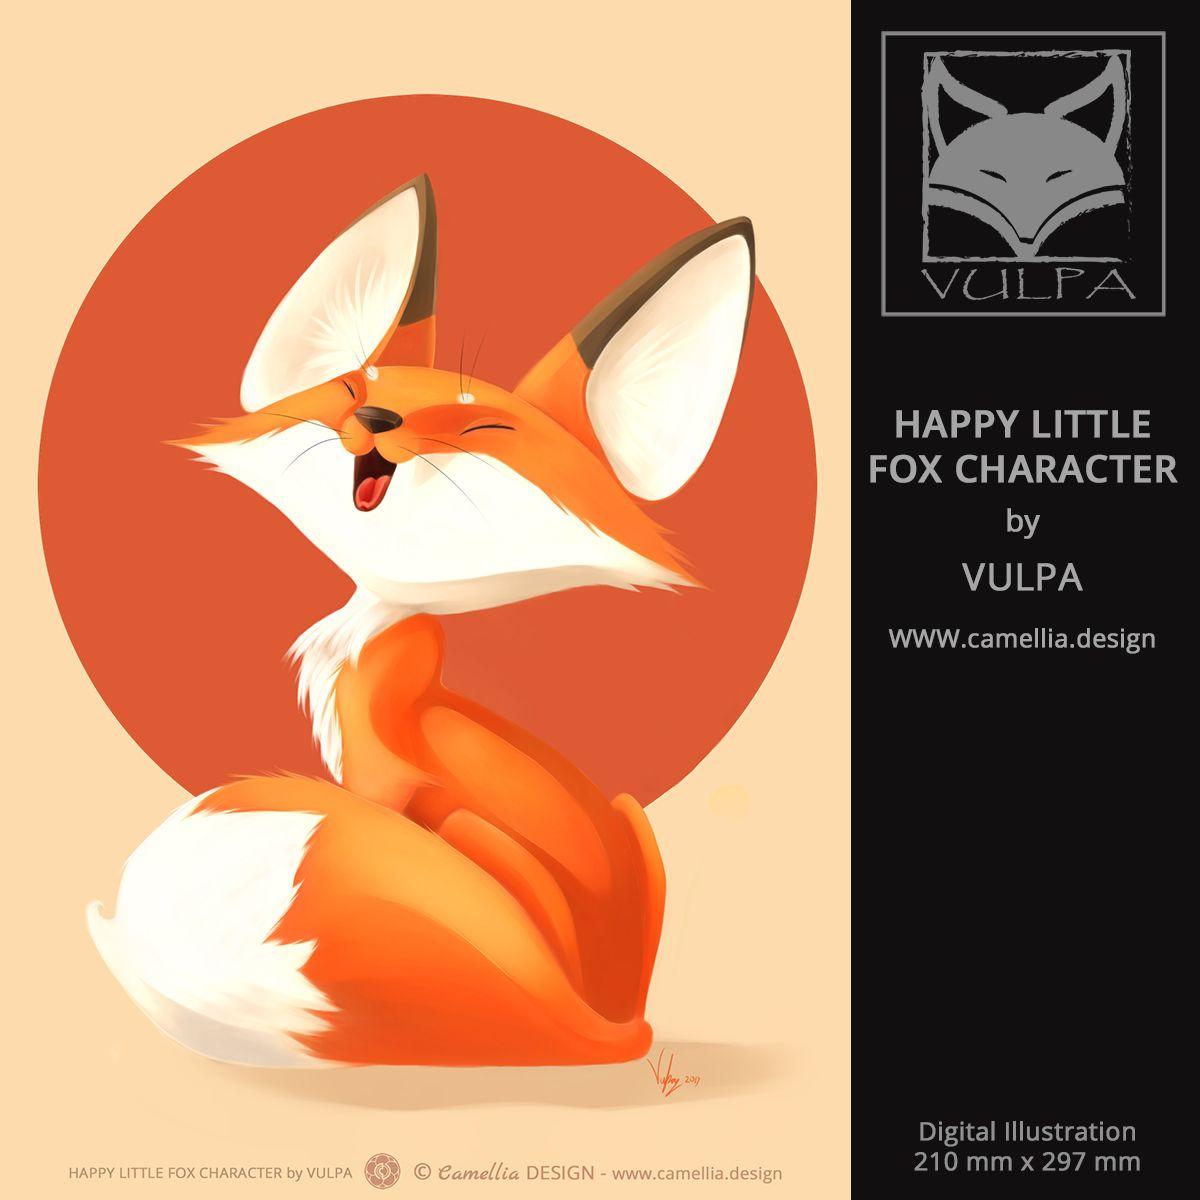 HAPPY LITTLE FOX CHARACTER